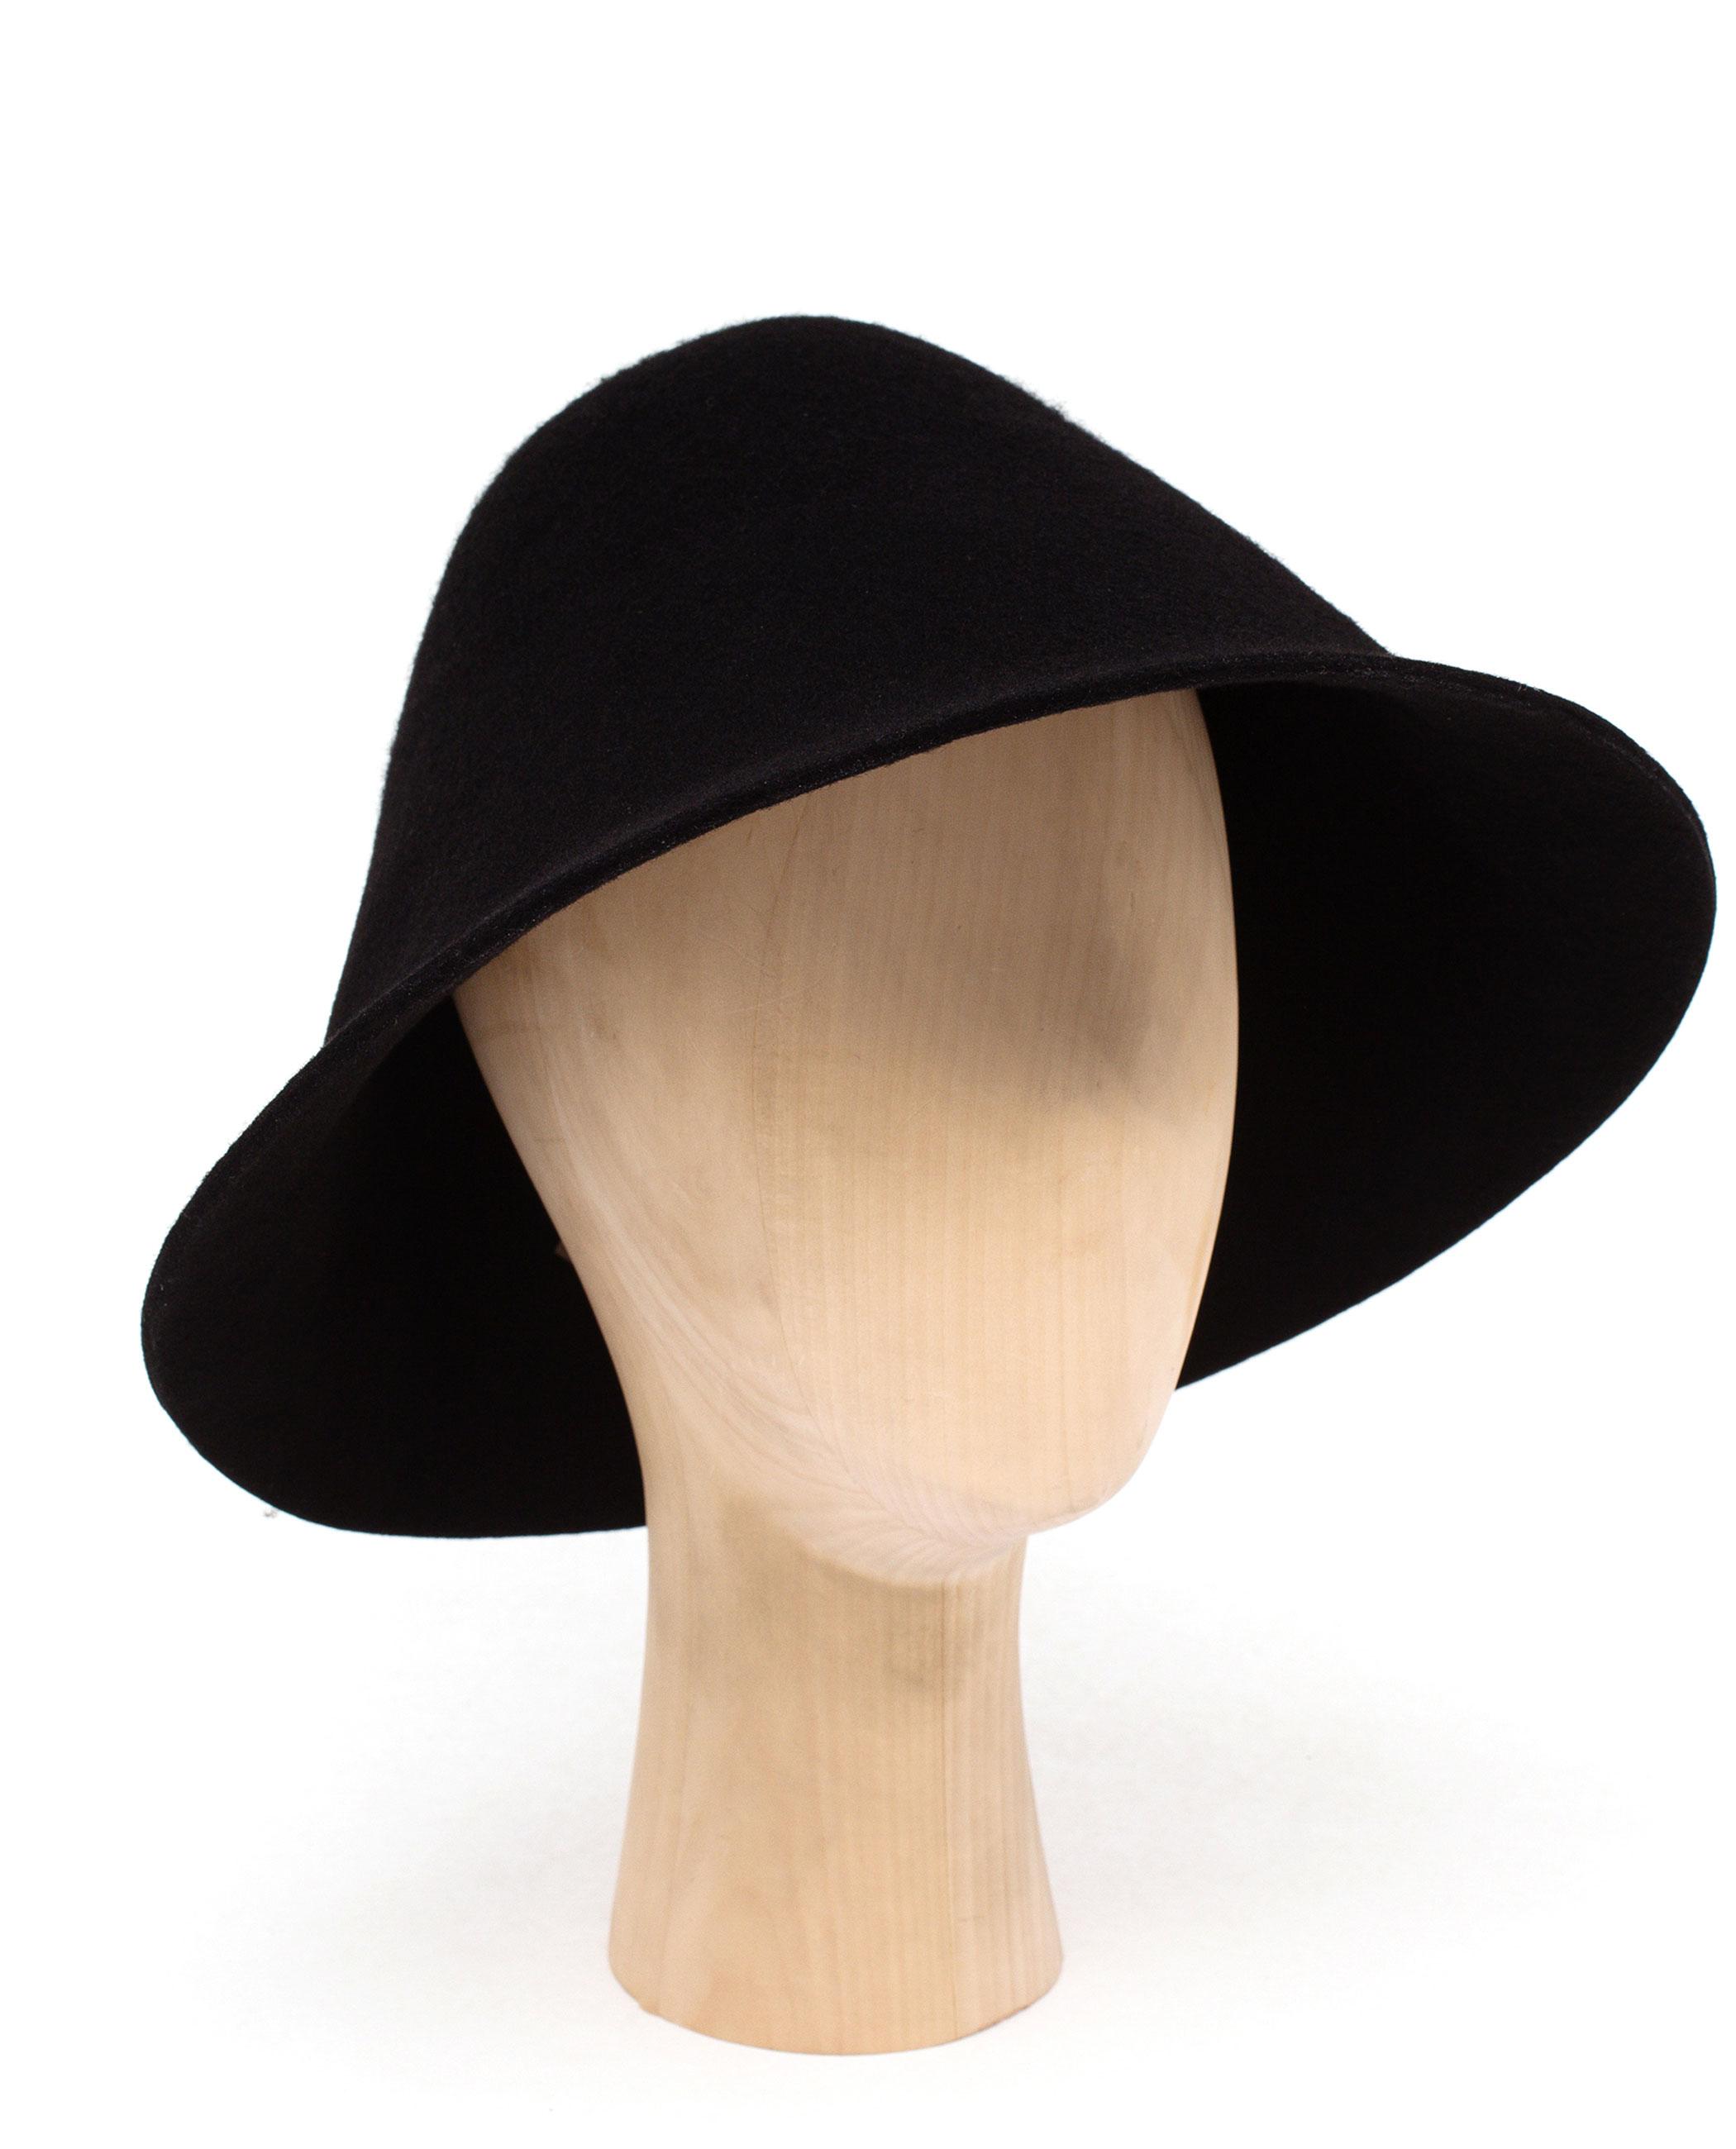 Comme des Garçons Felt Wool Hat in Black - Lyst 643a5d87940